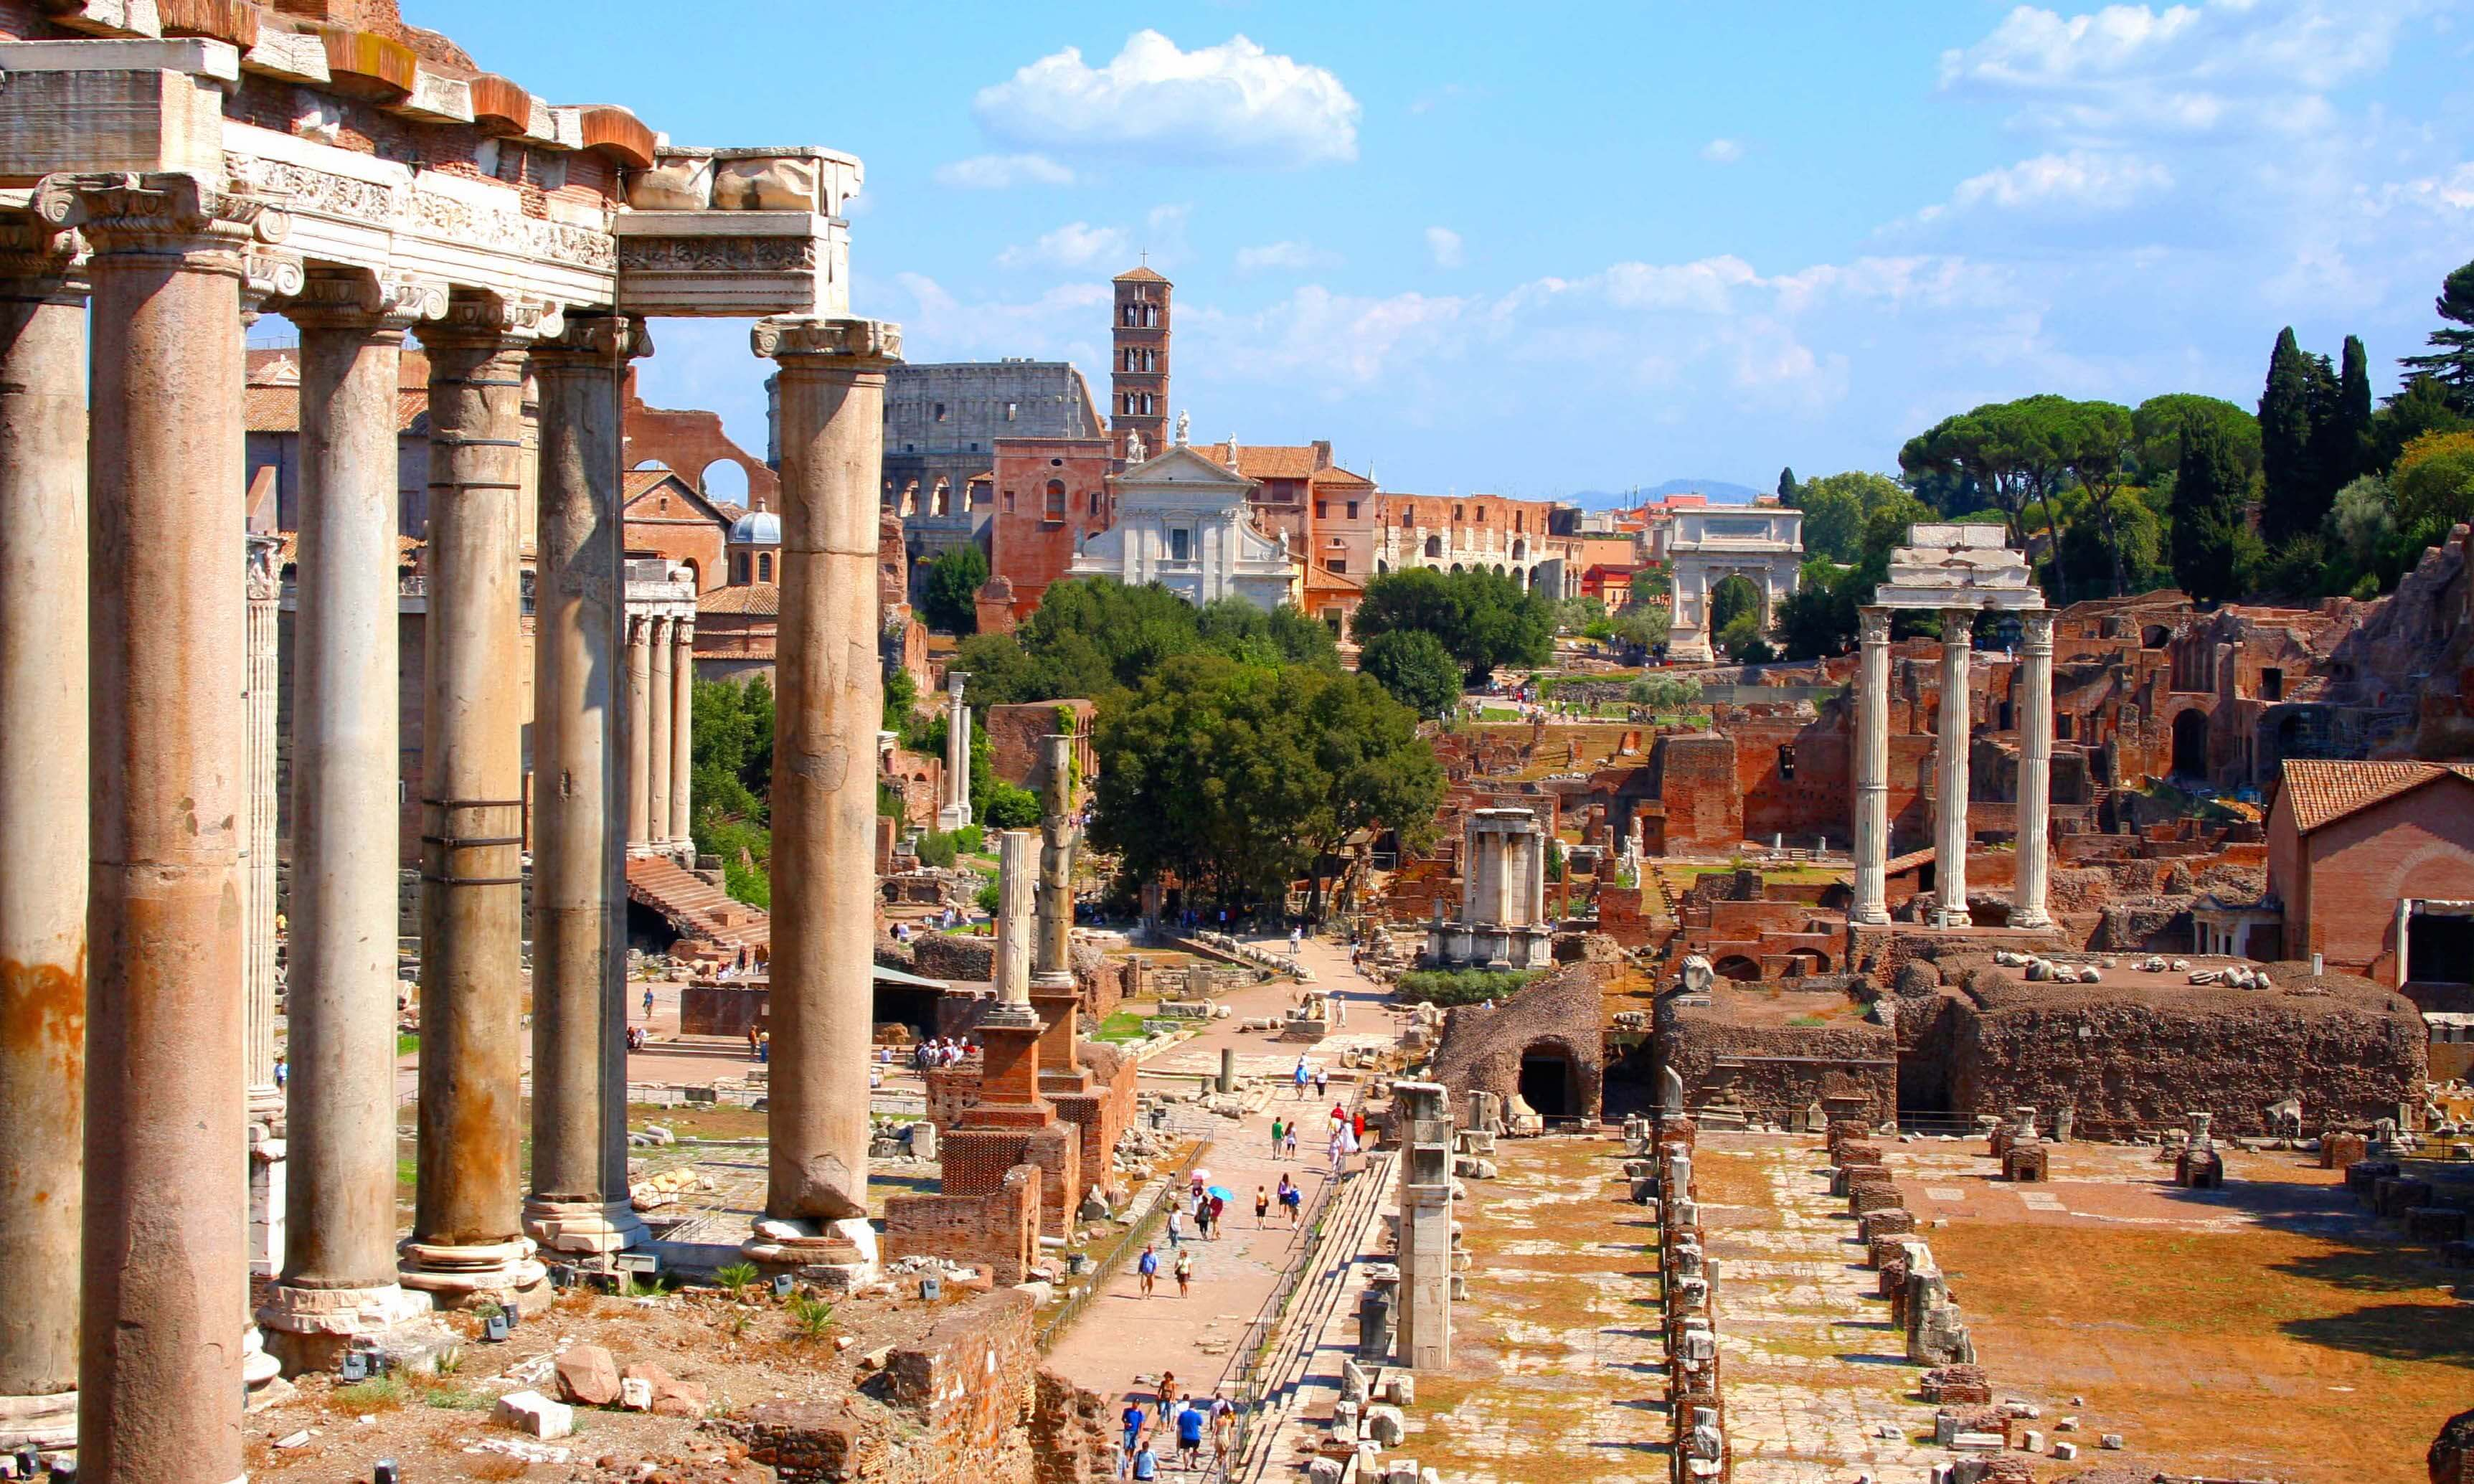 Roman Forum, Rome, Italy, September 2007